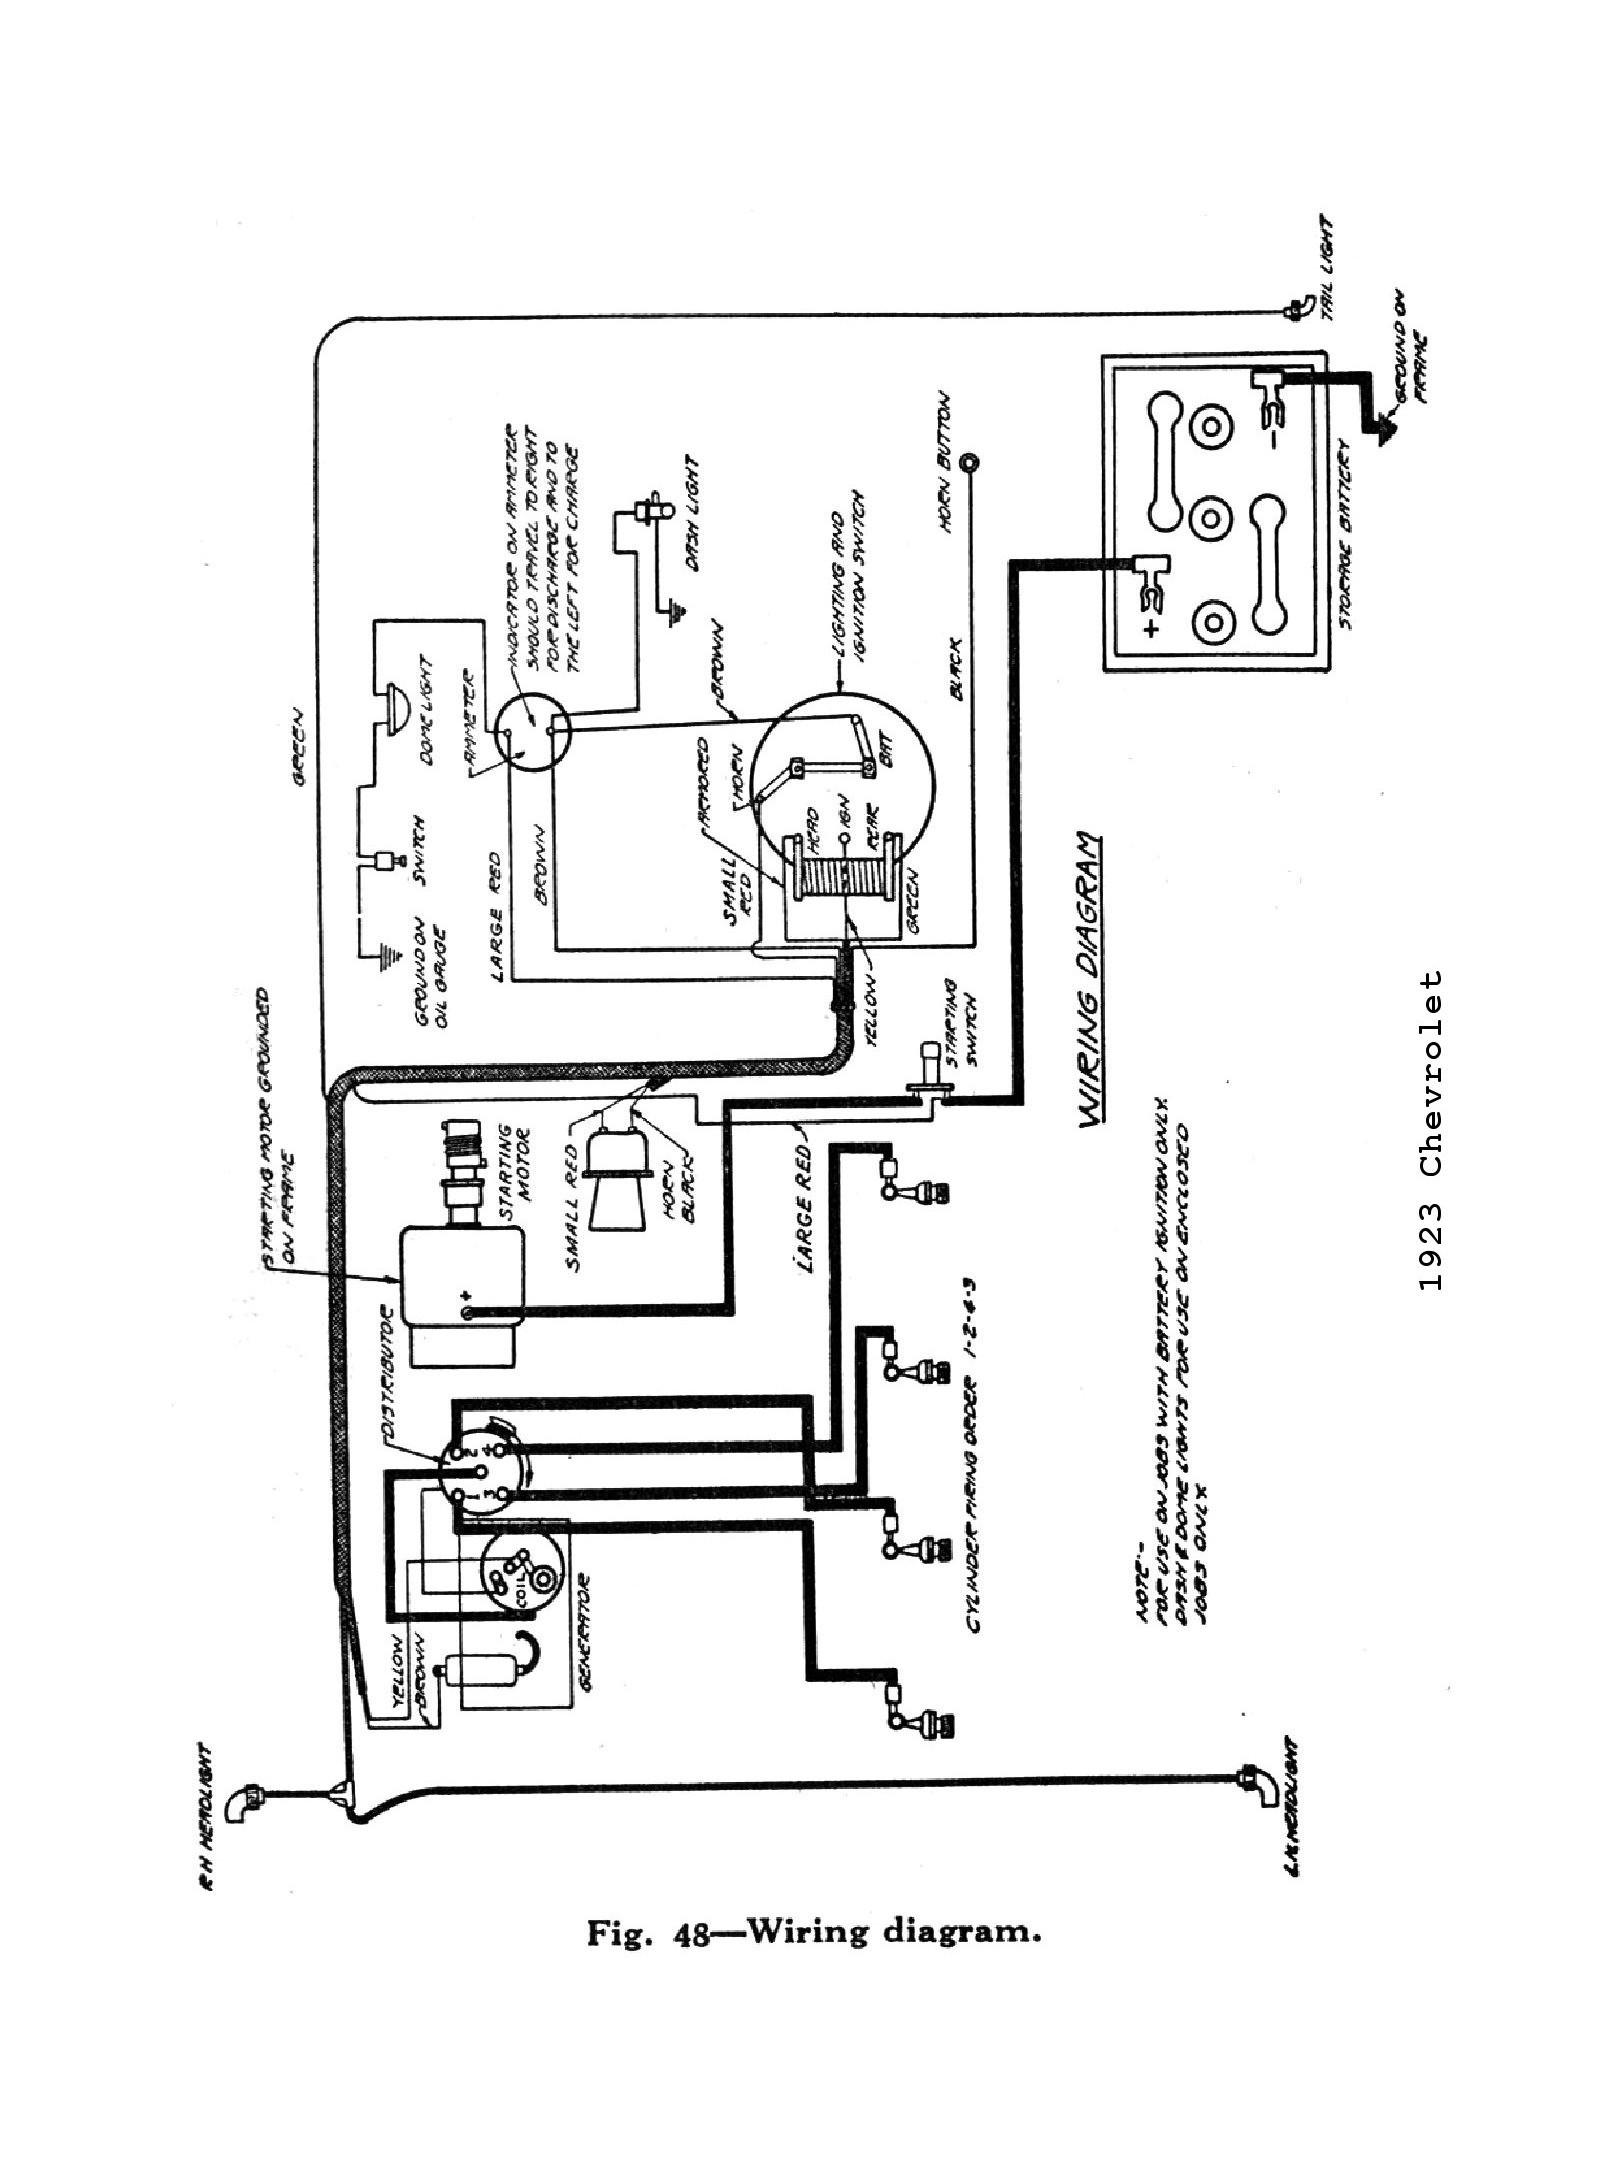 Semi Truck Engine Diagram Chevy Wiring Diagrams Of Semi Truck Engine Diagram